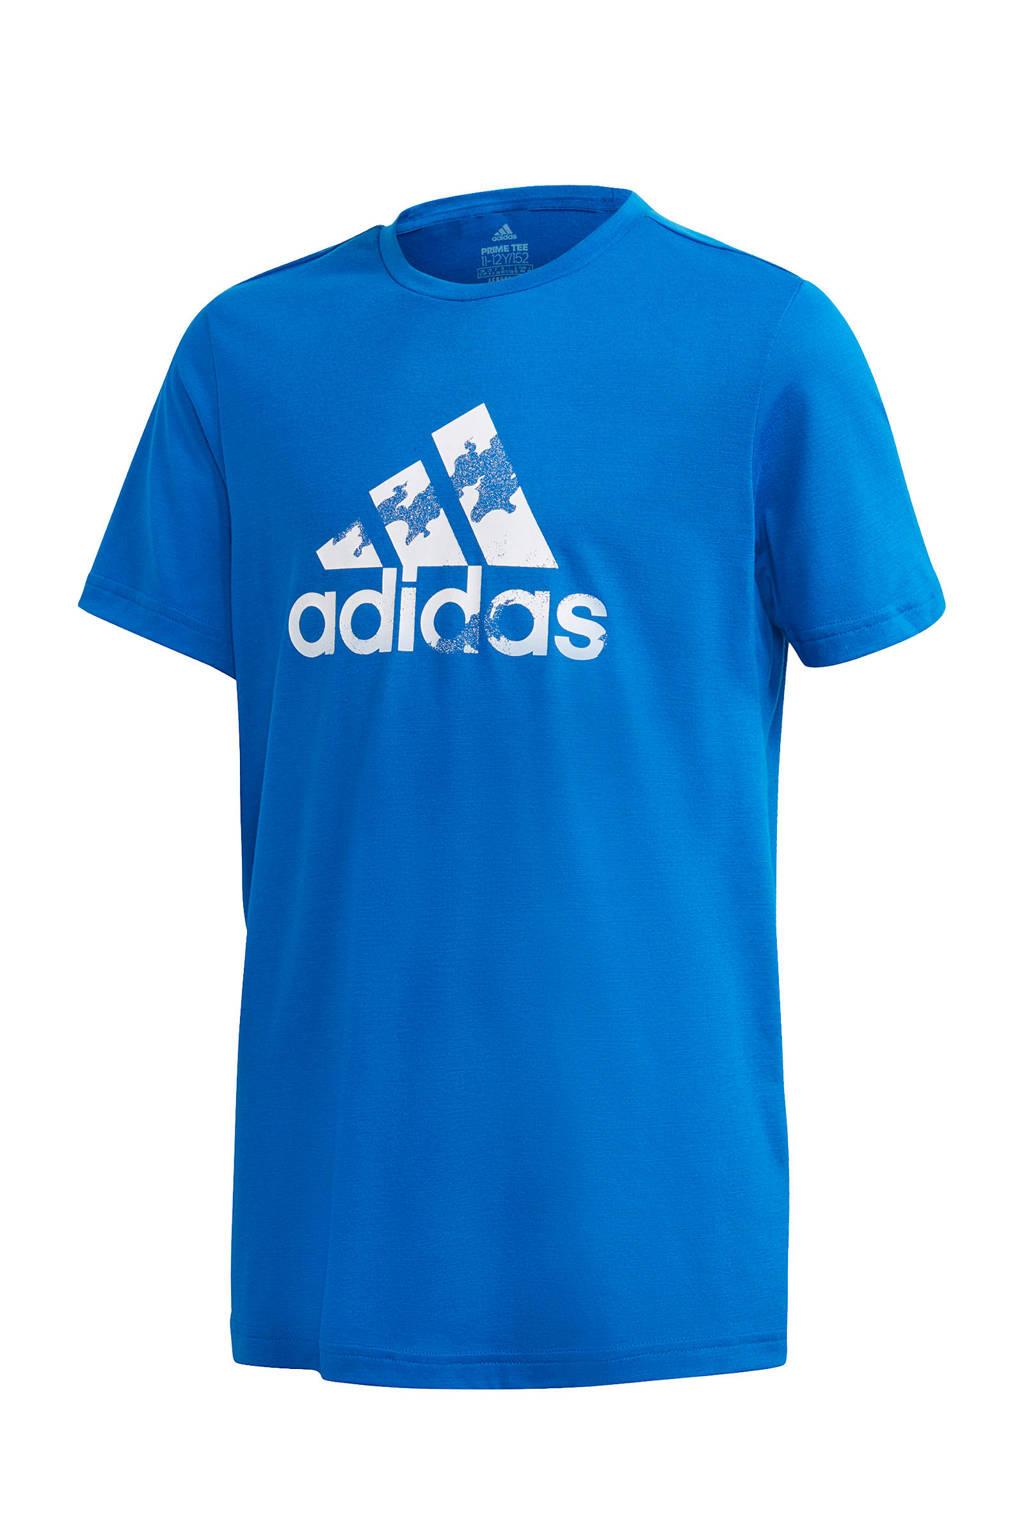 adidas Performance   sport T-shirt blauw/wit, Blauw/wit